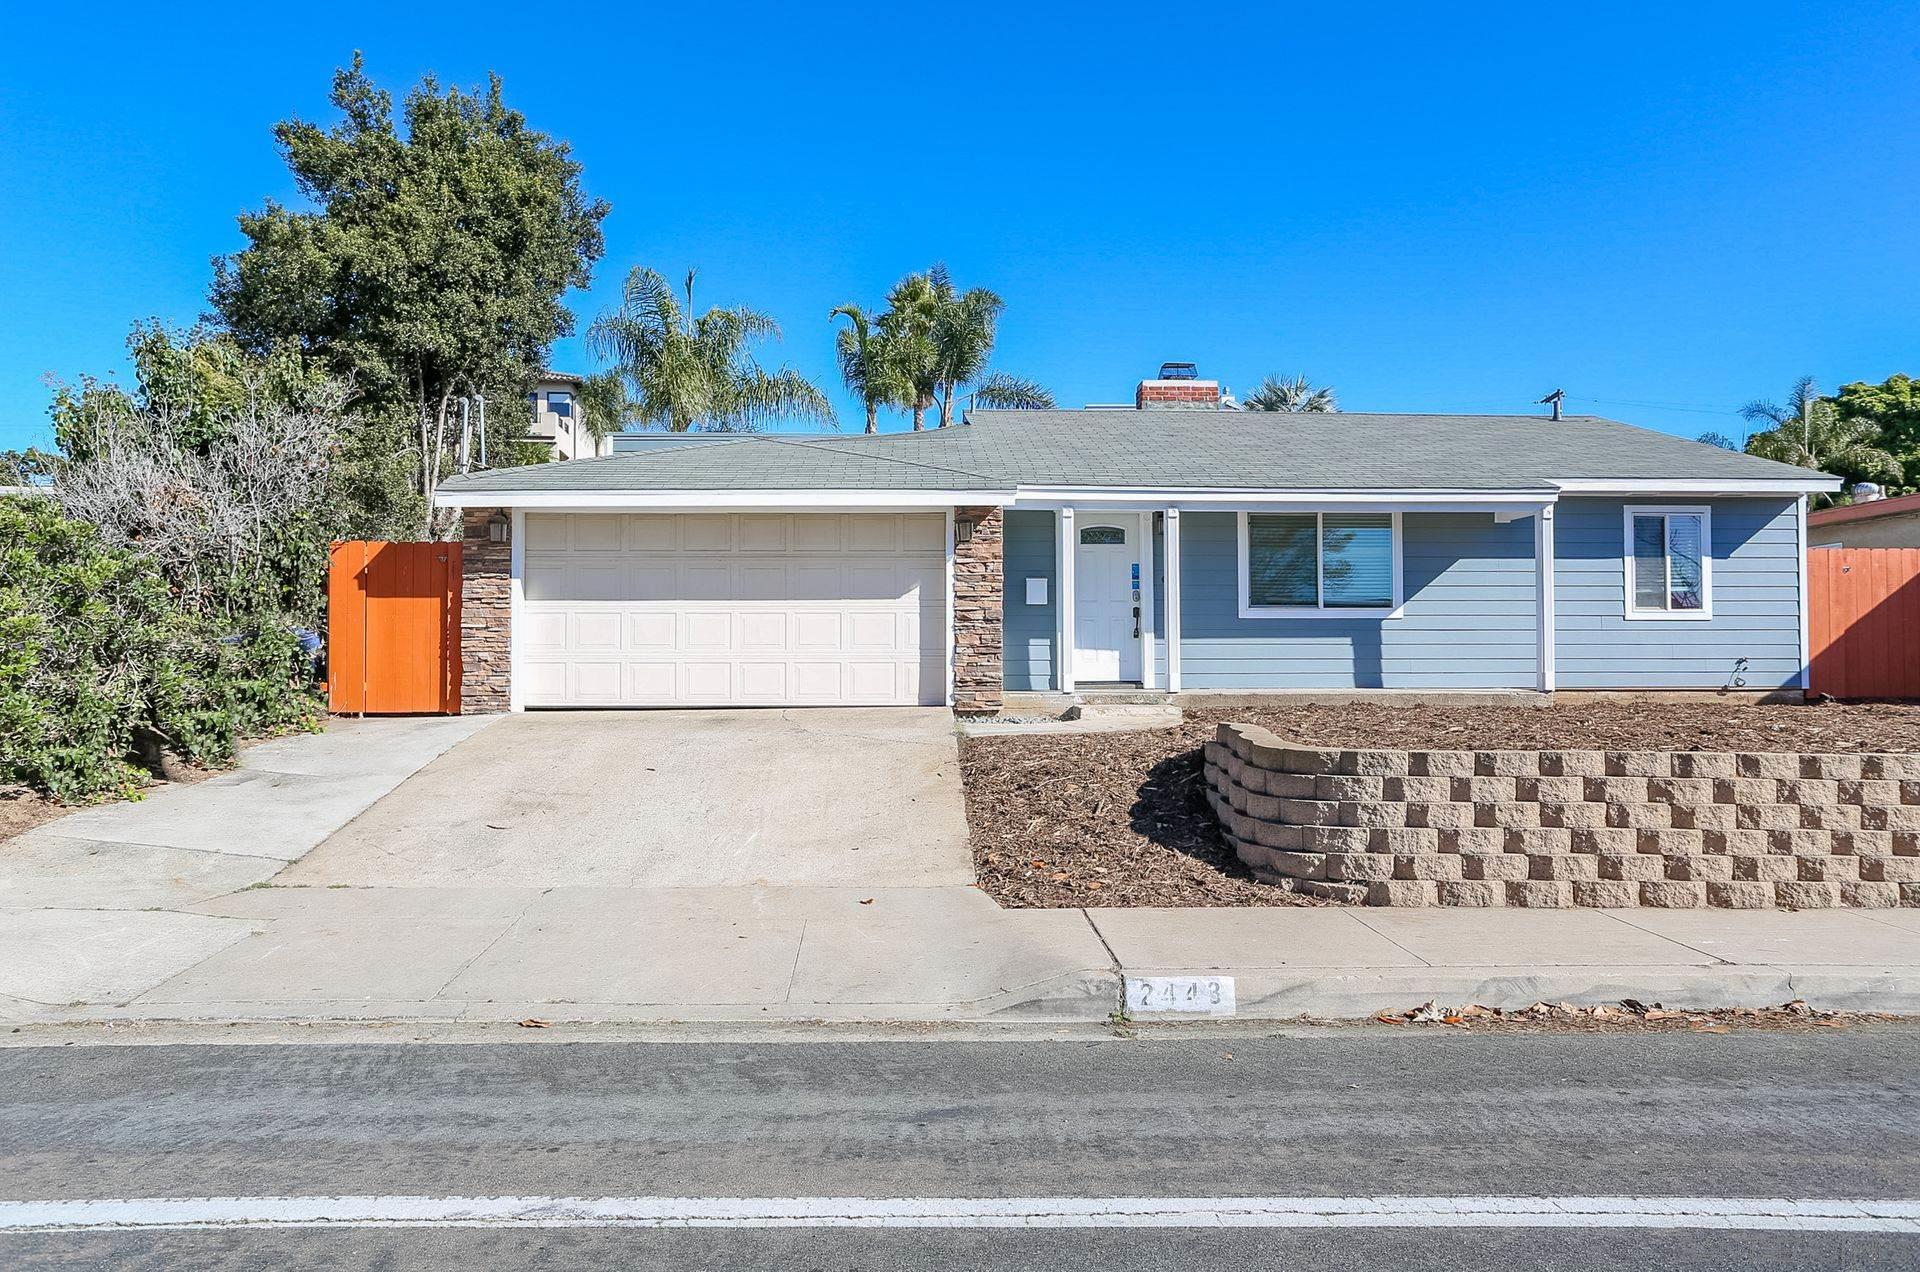 2443 Burgener, San Diego, CA 92110